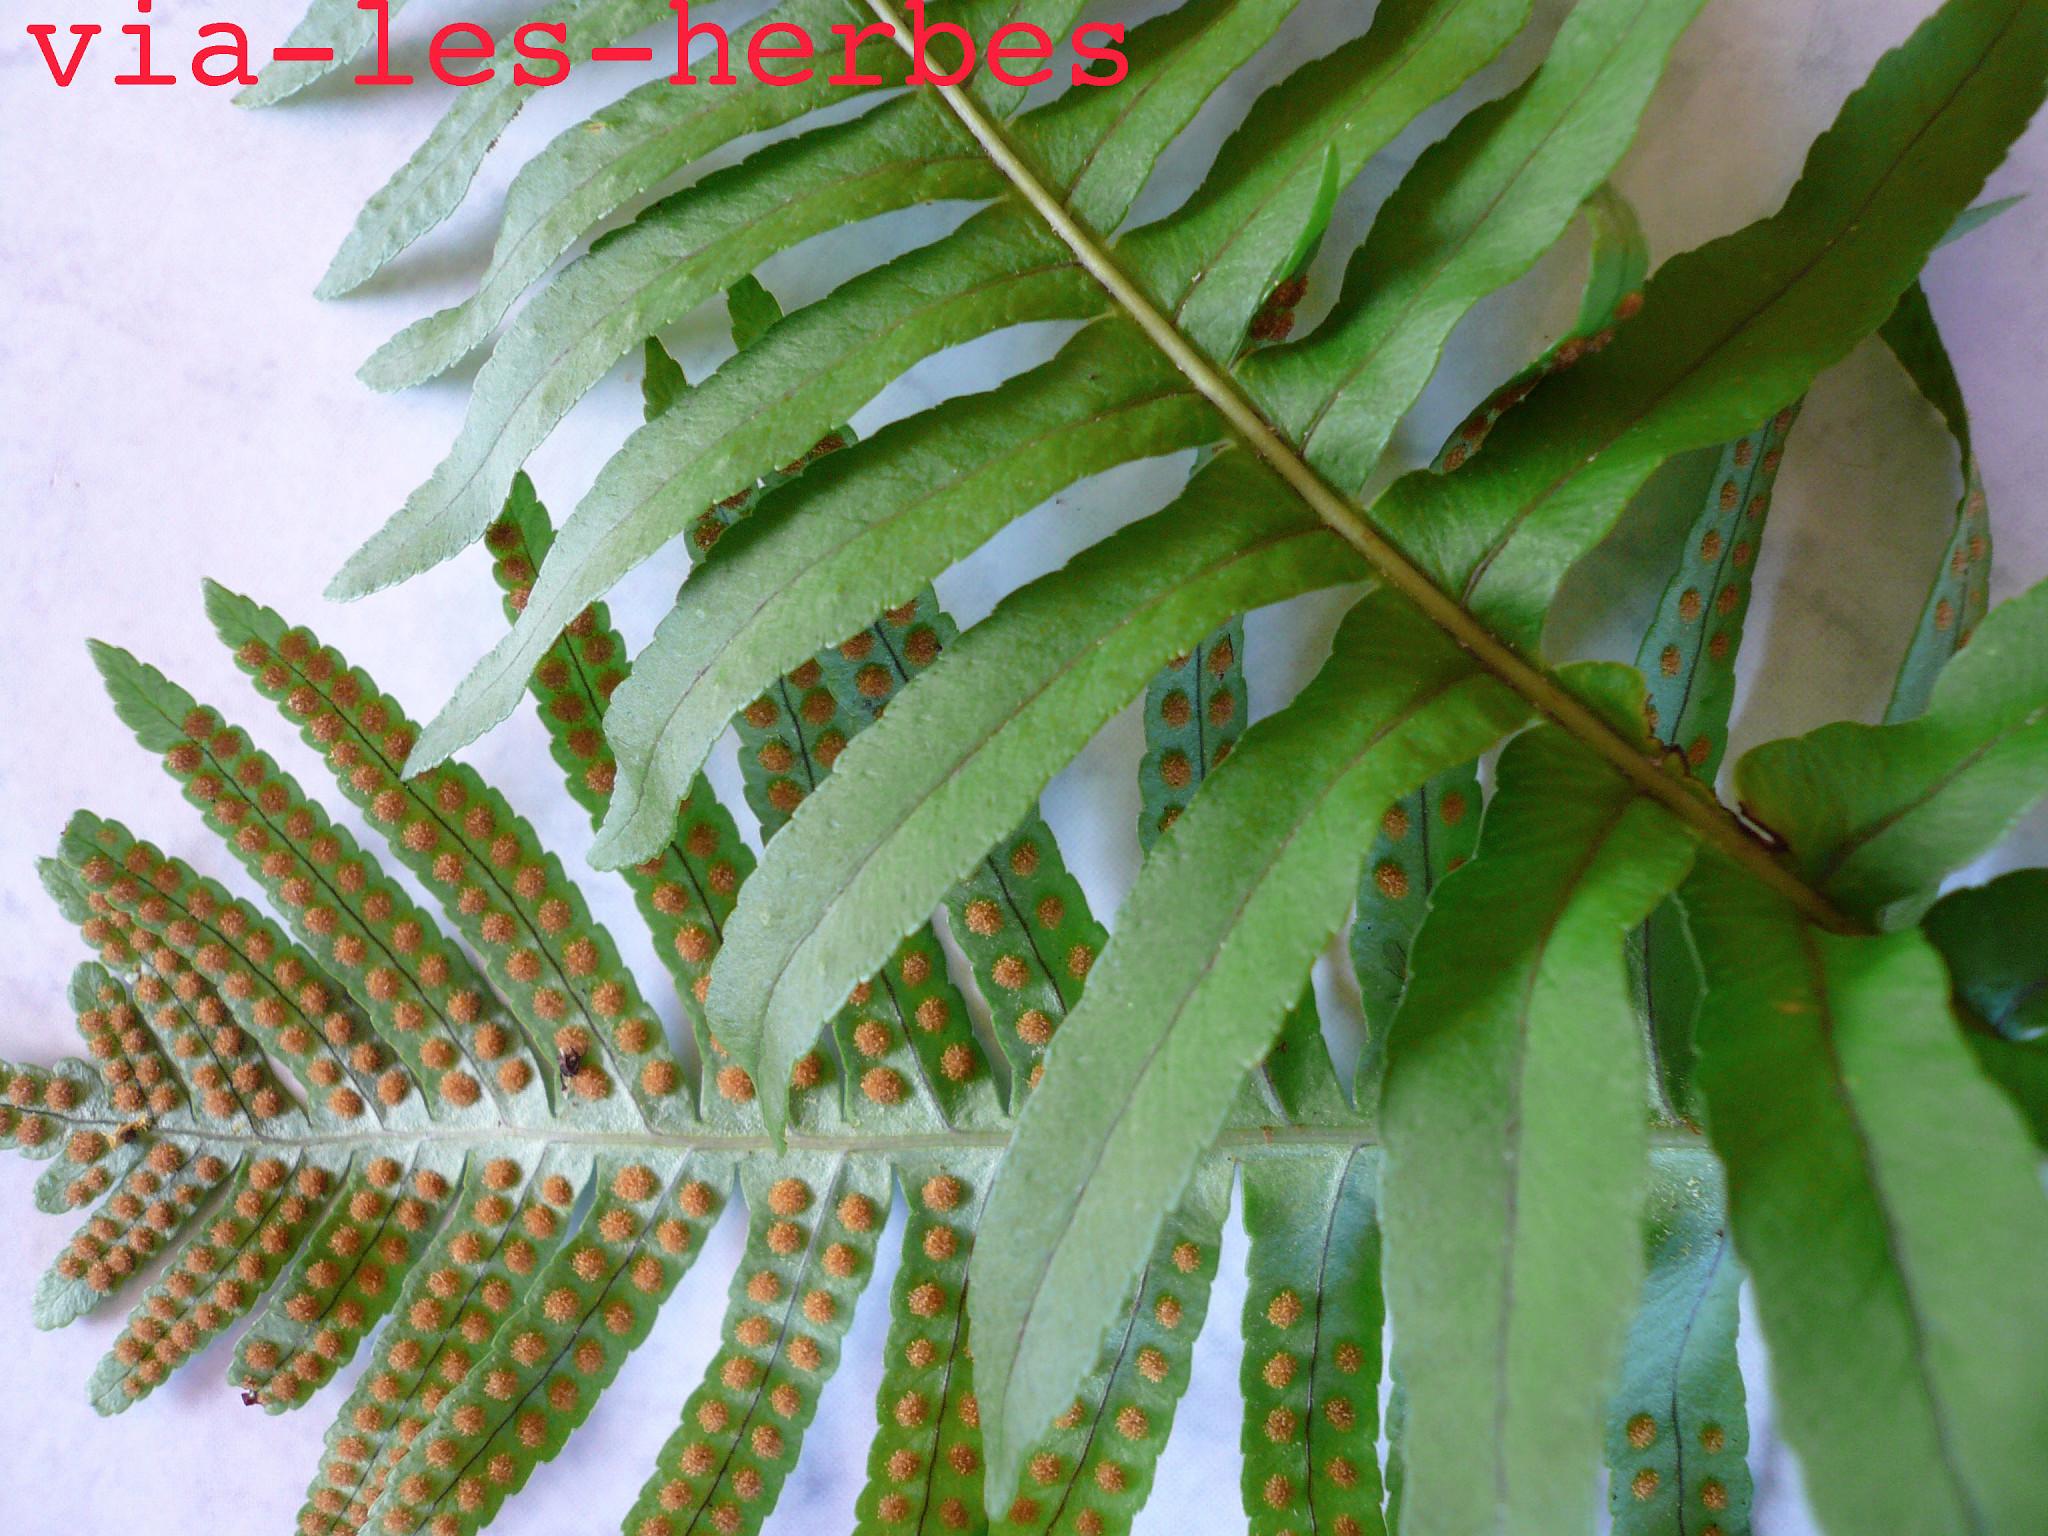 Herbier via les herbes for Portent feuilles